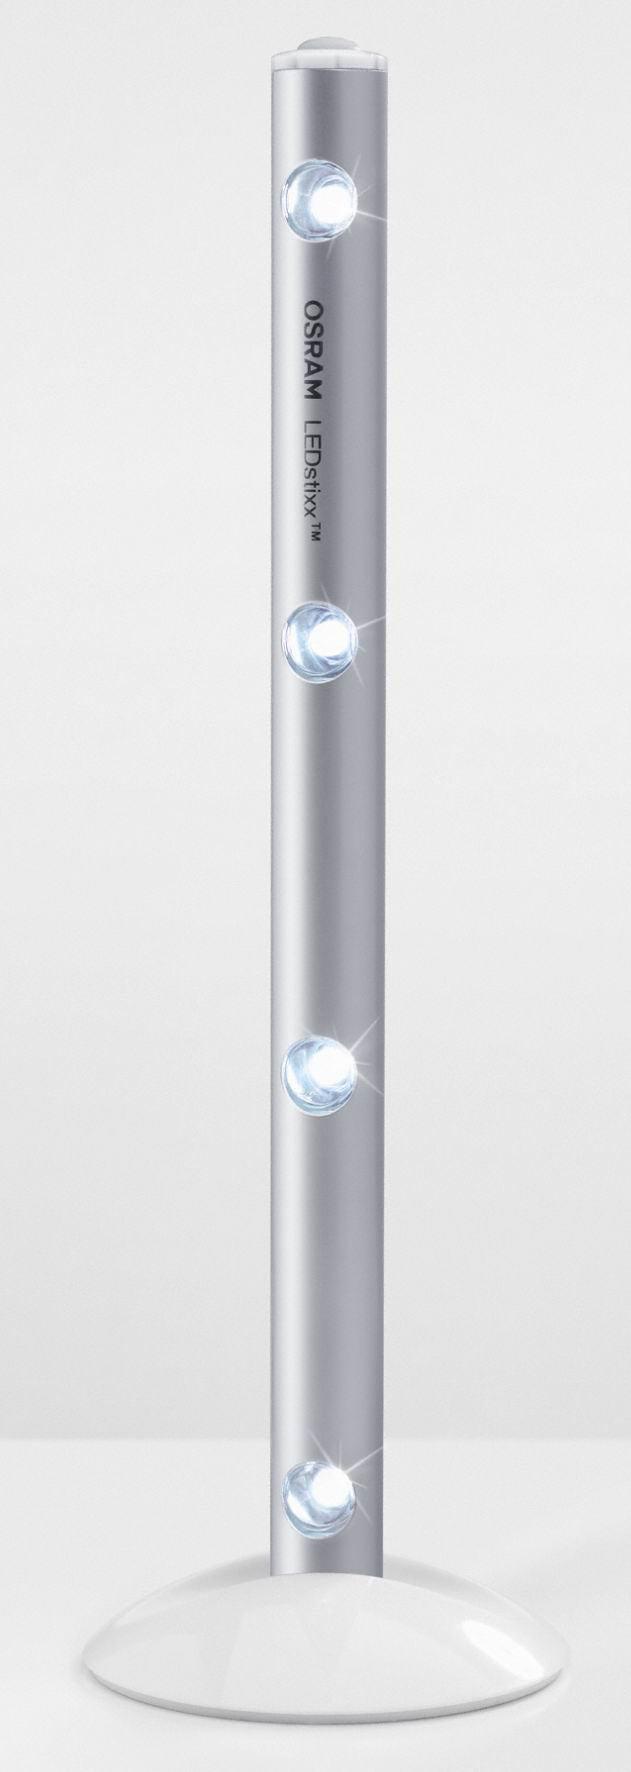 Eclairage A Piles Ledstixx Led Integree Blanc Froid Leroy Merlin